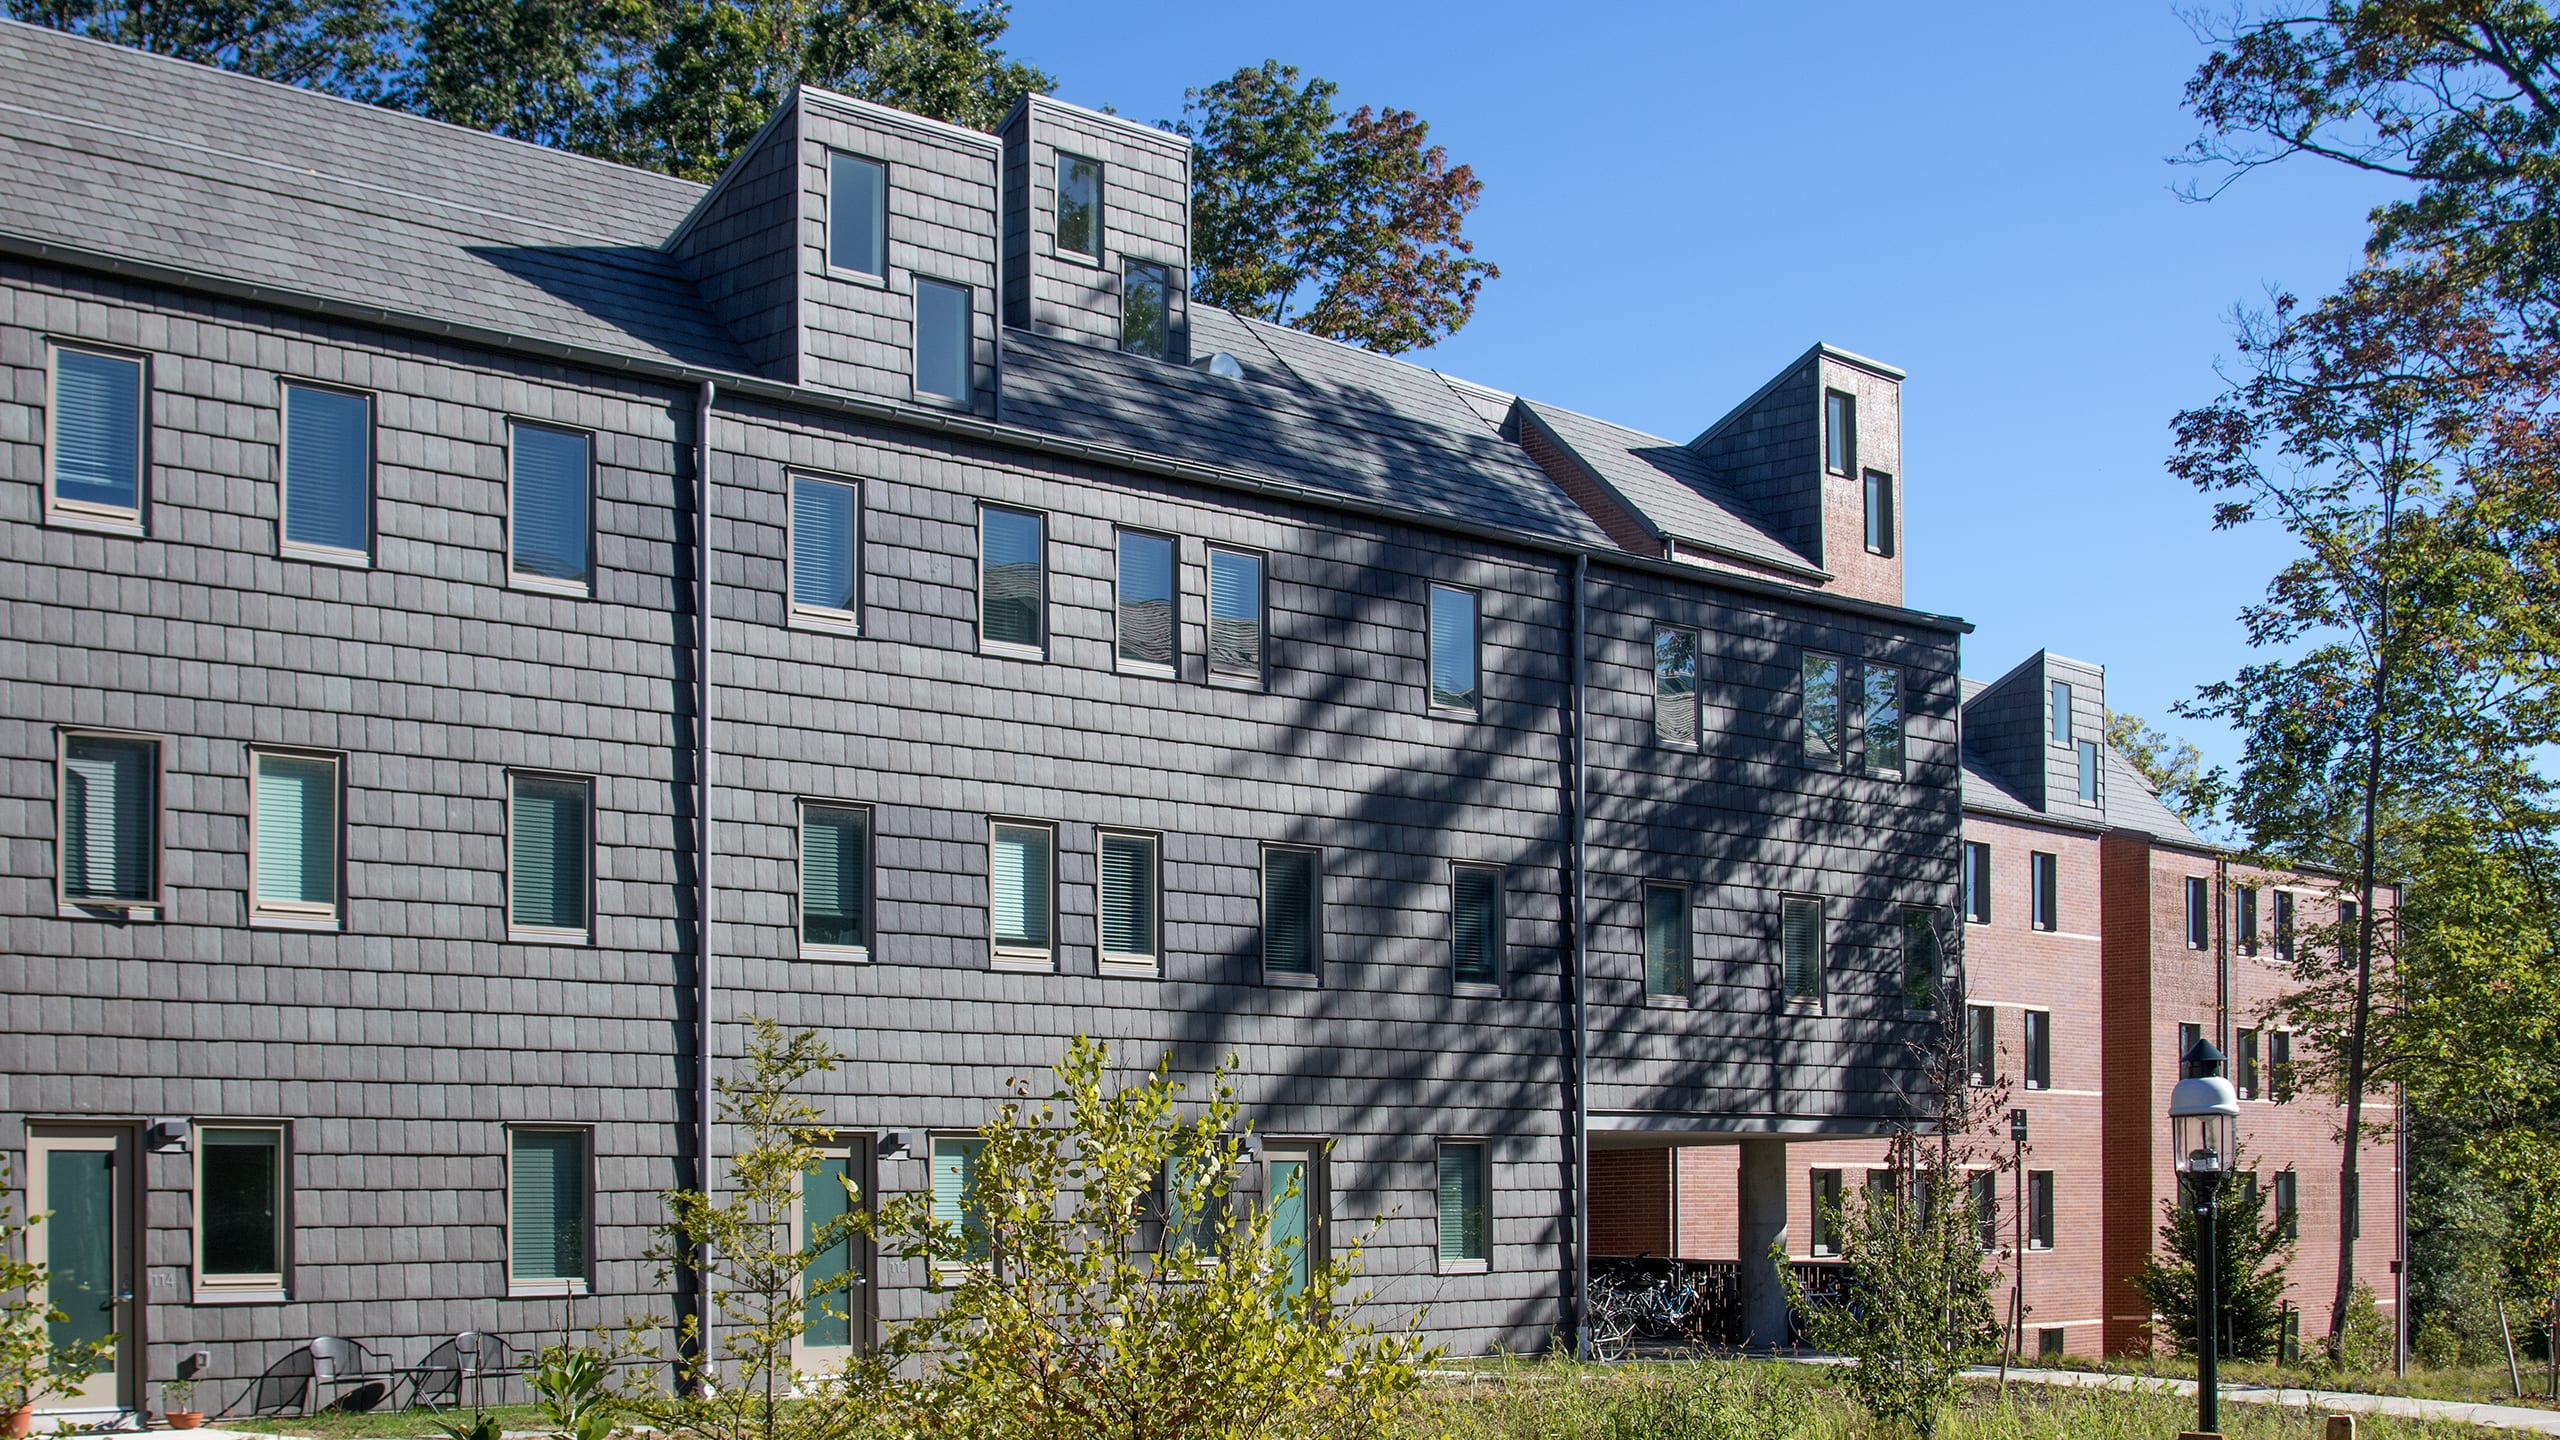 Princeton University - Lakeside Graduate Housing Ludowici Roof Tile